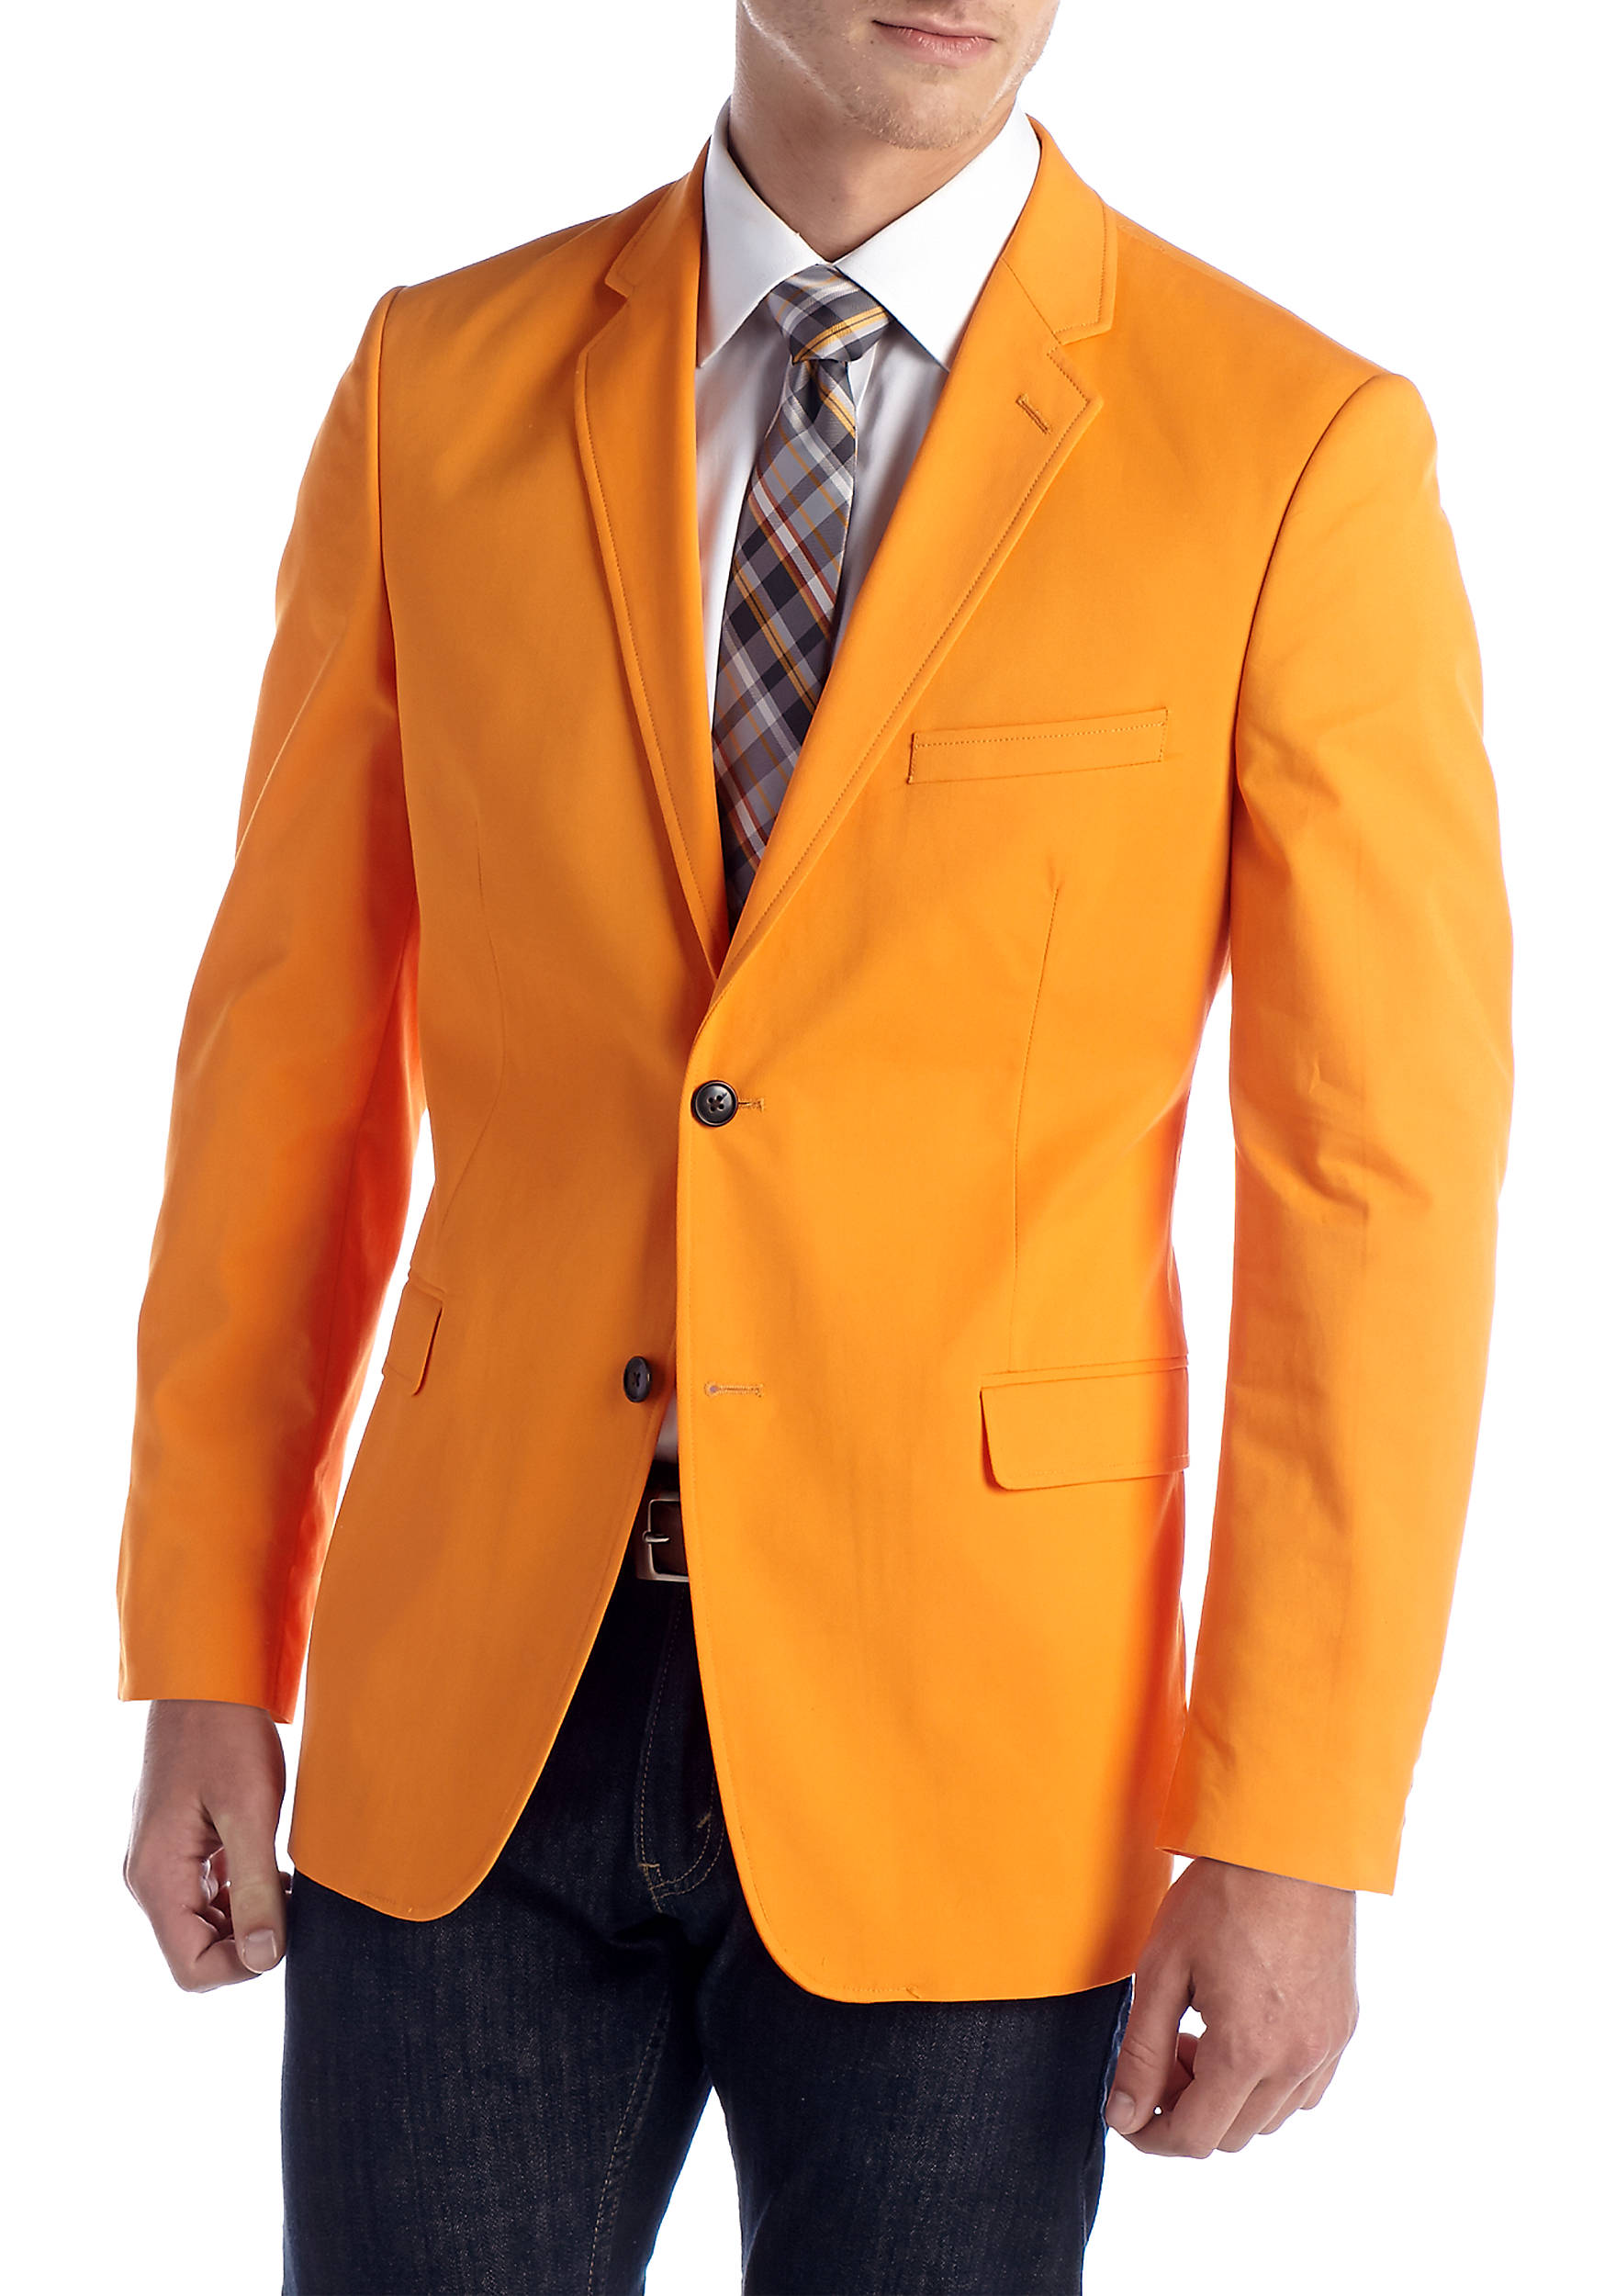 Saddlebred® Classic-Fit Cotton Oxford Bright Orange Blazer | belk